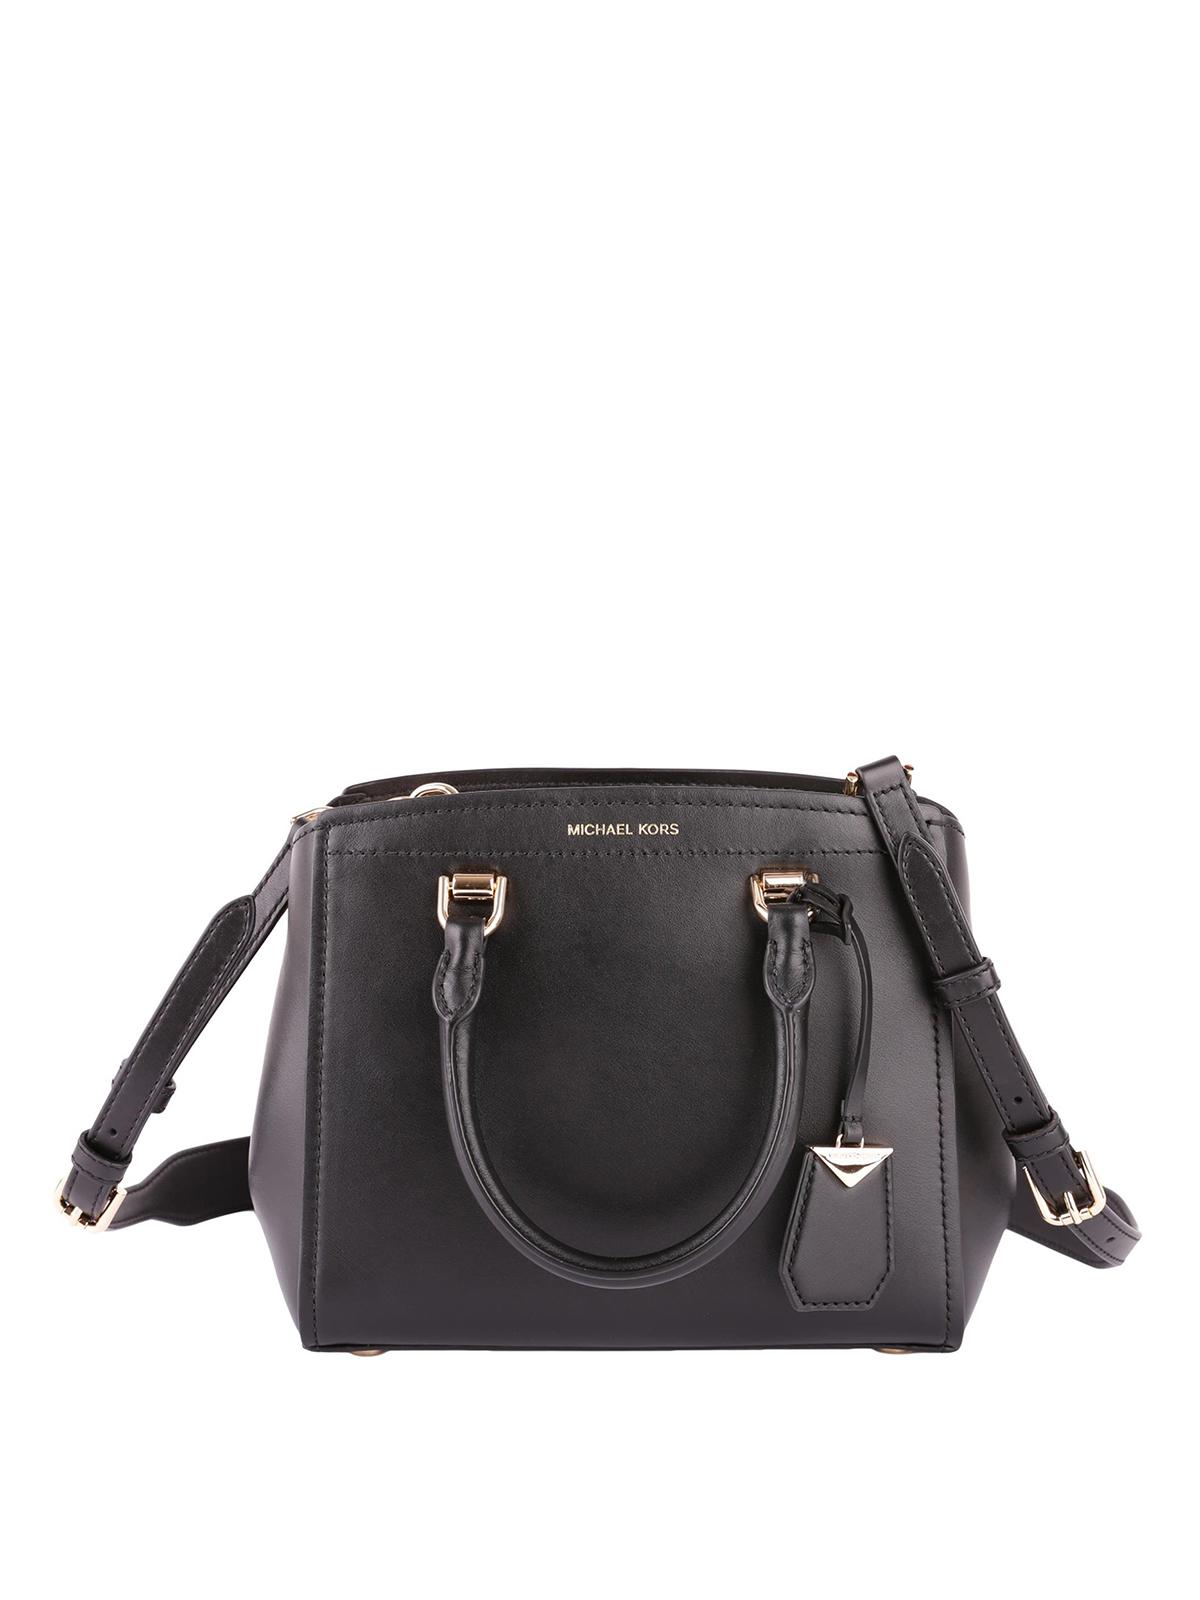 d10d76e4ed14 Michael Kors - Benning medium black leather bag - bowling bags ...